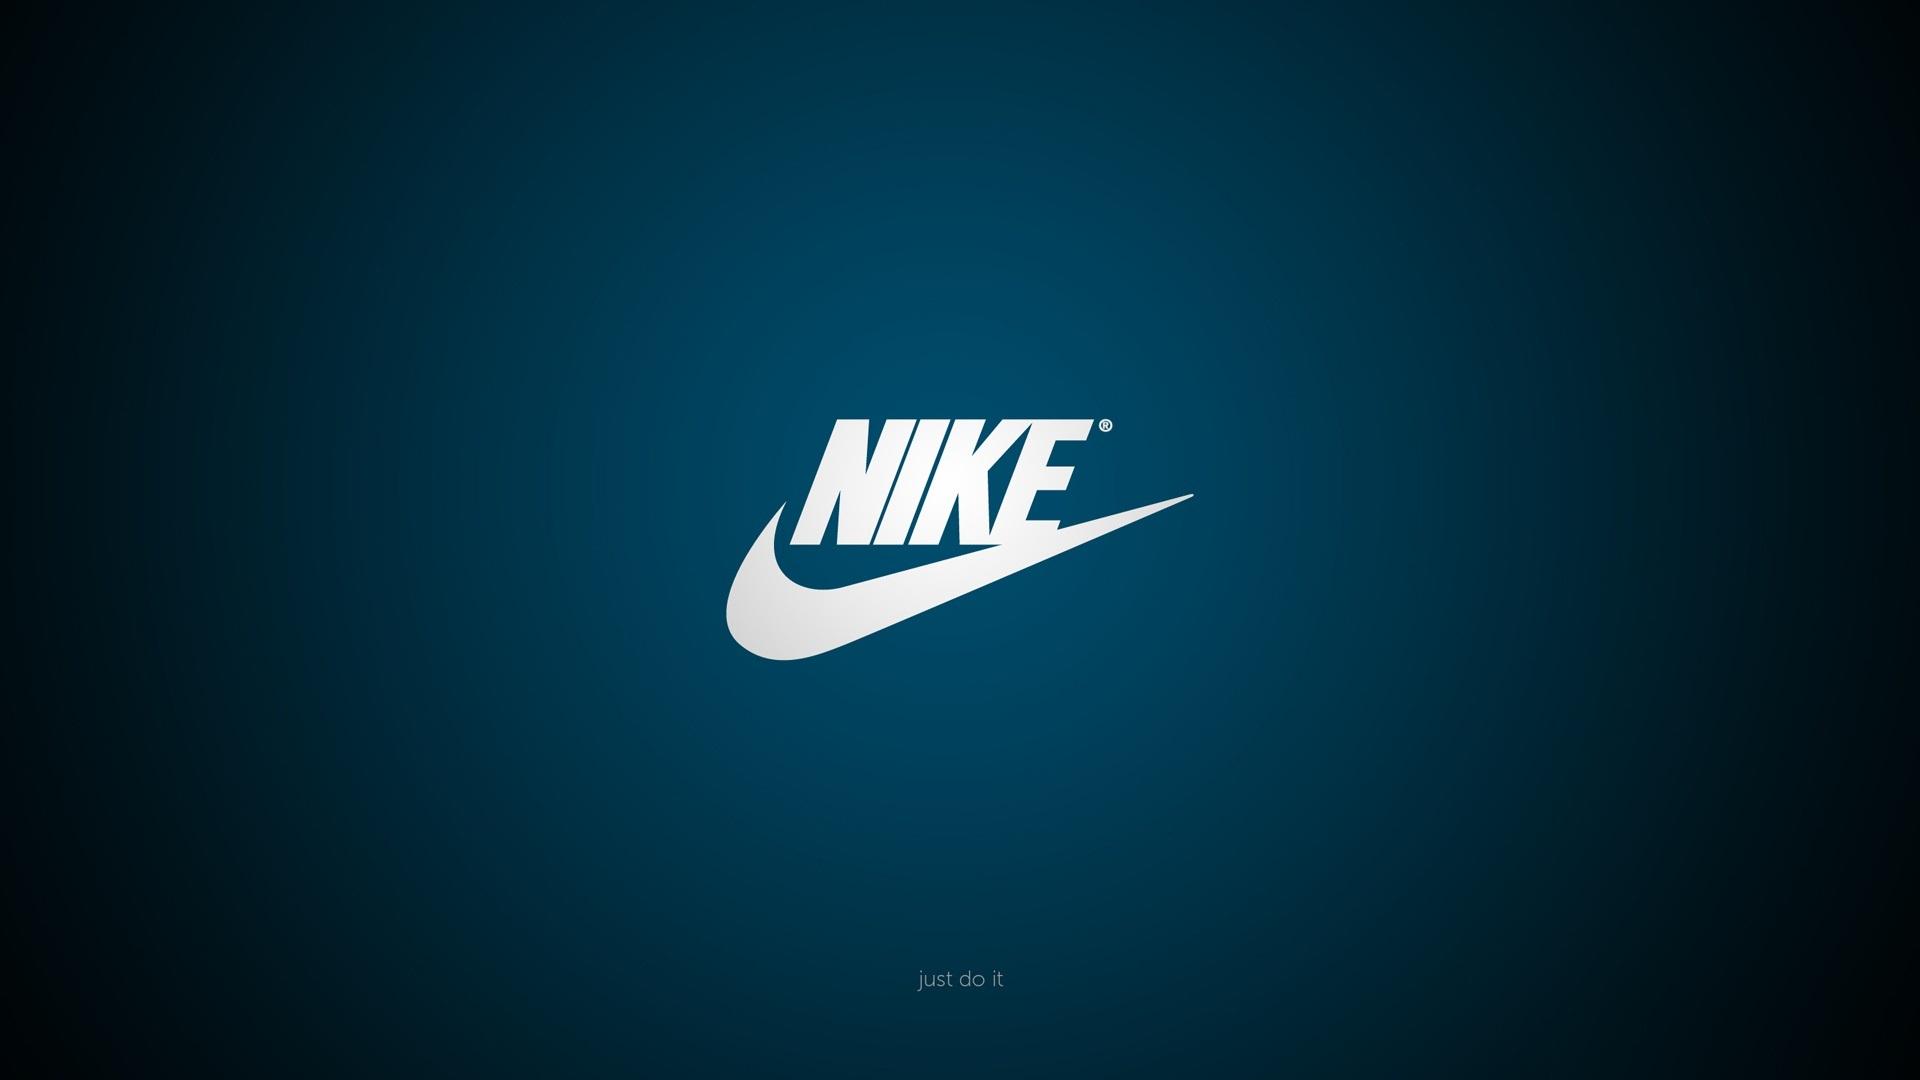 Nike Wallpapers 1280x1024 Nike Wallpapers Widescreen Desktop 1920x1080